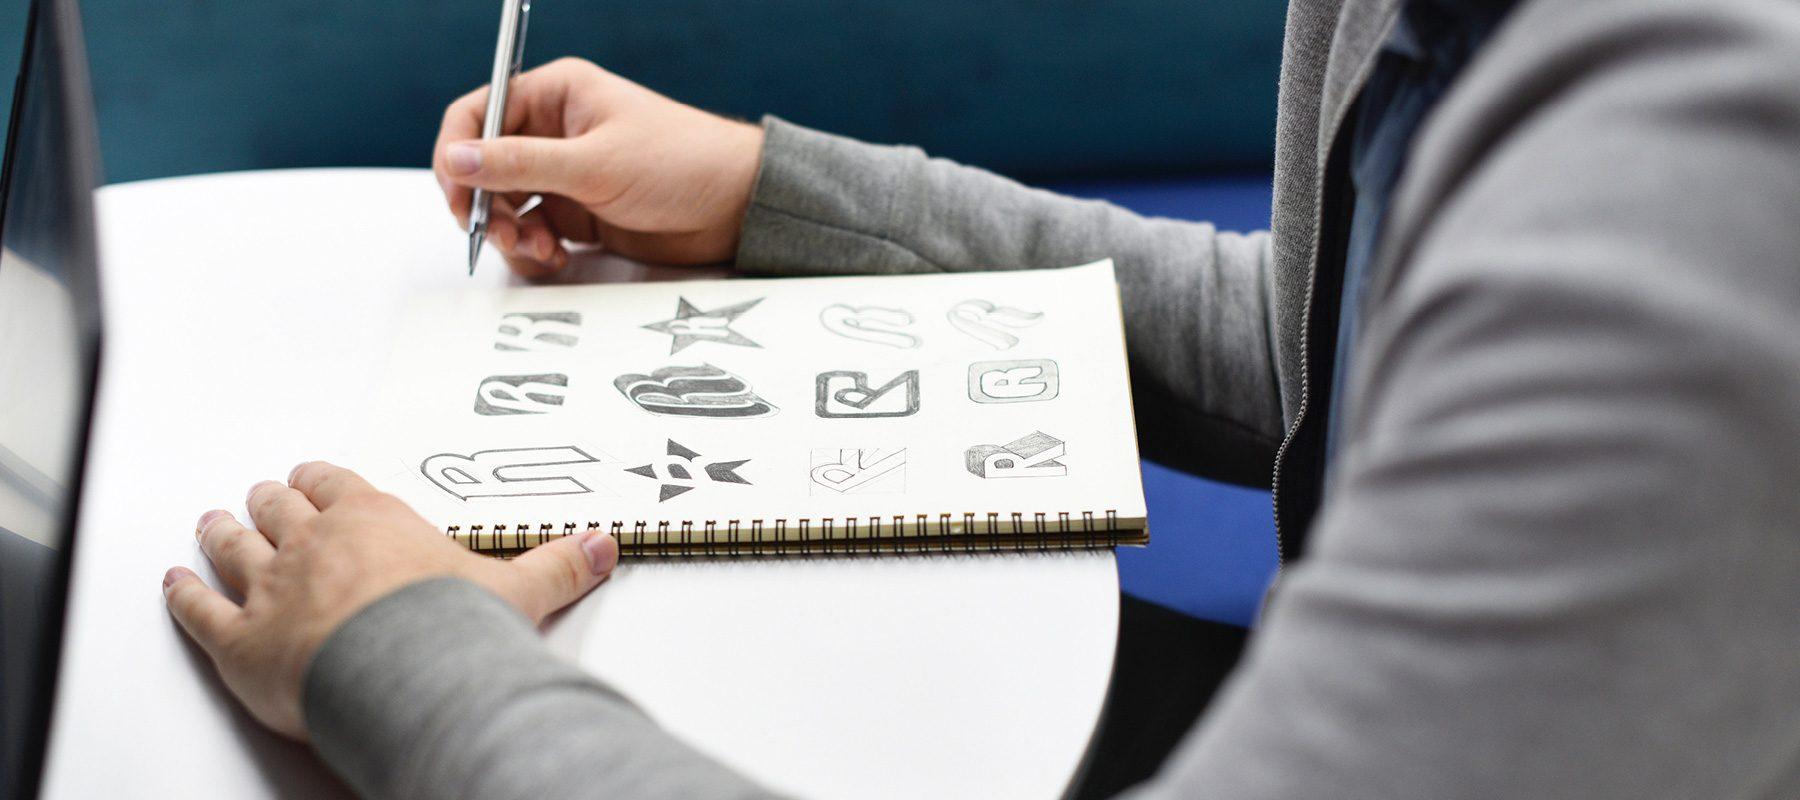 Creating a successful brand identity